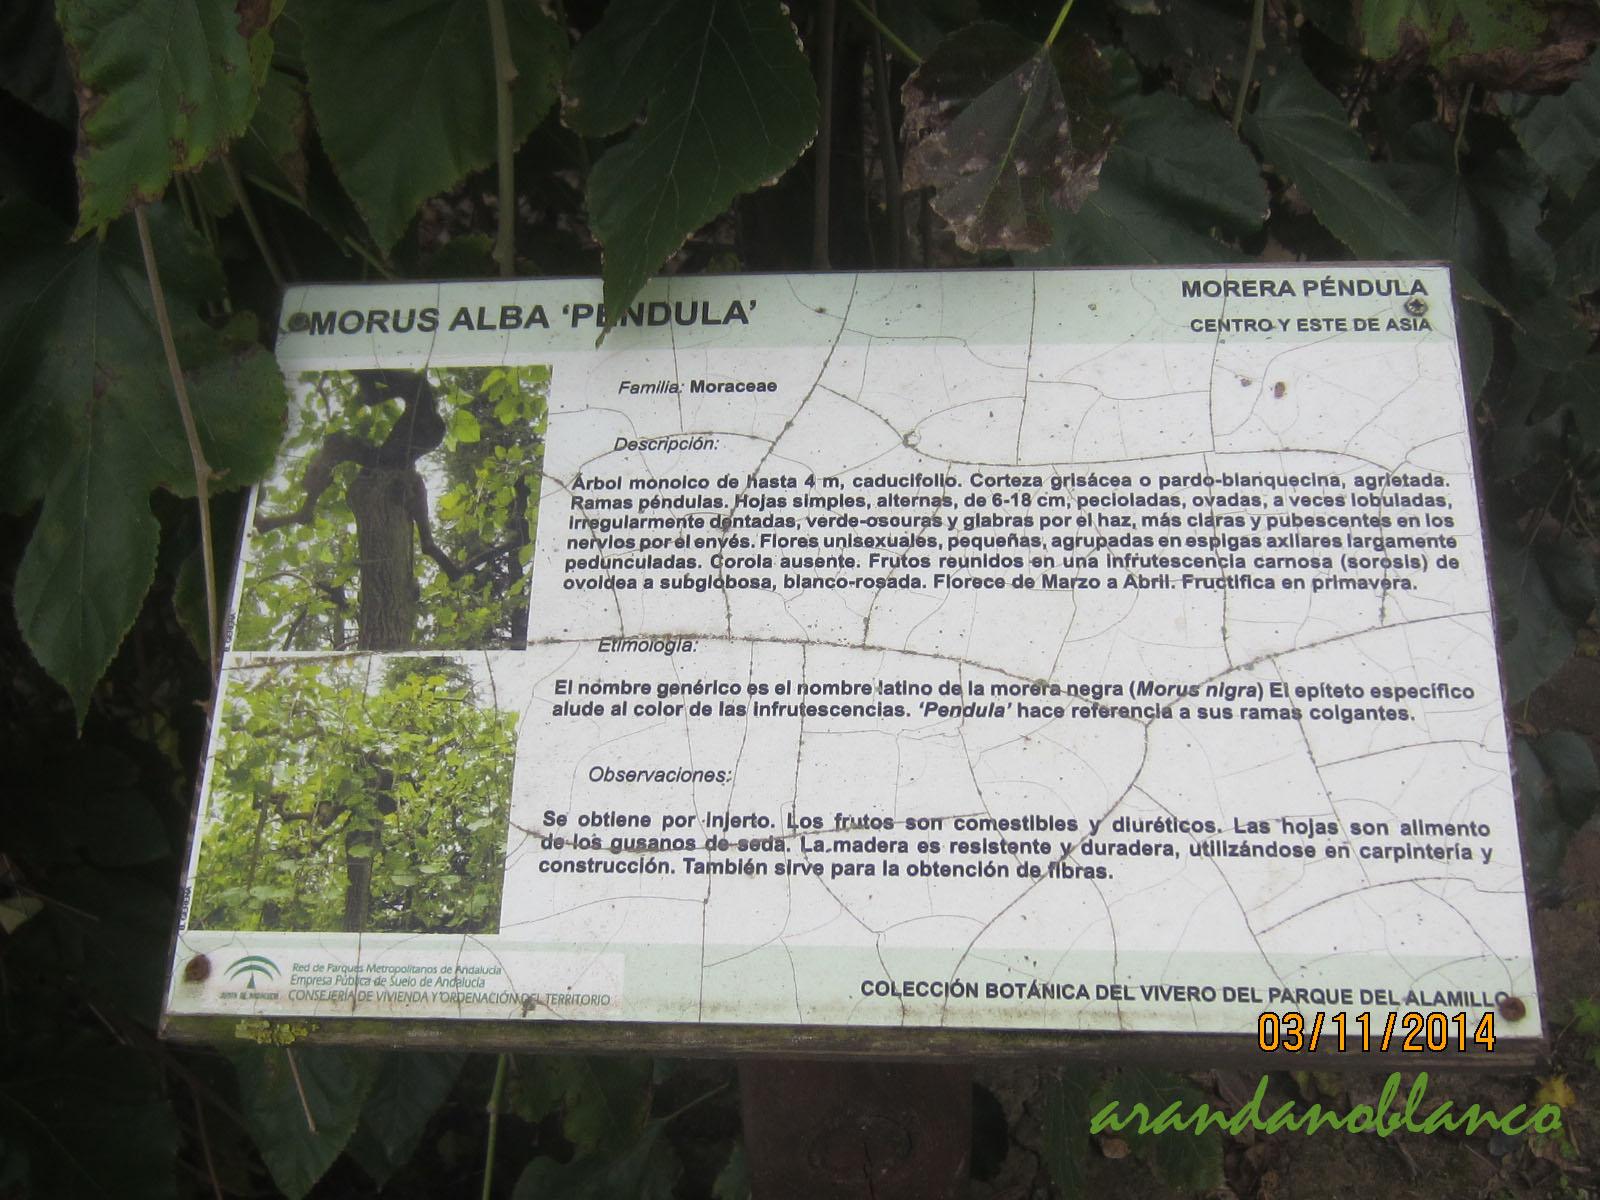 Parquealamillo encinarosa morus alba p ndula morus for Vivero del parque